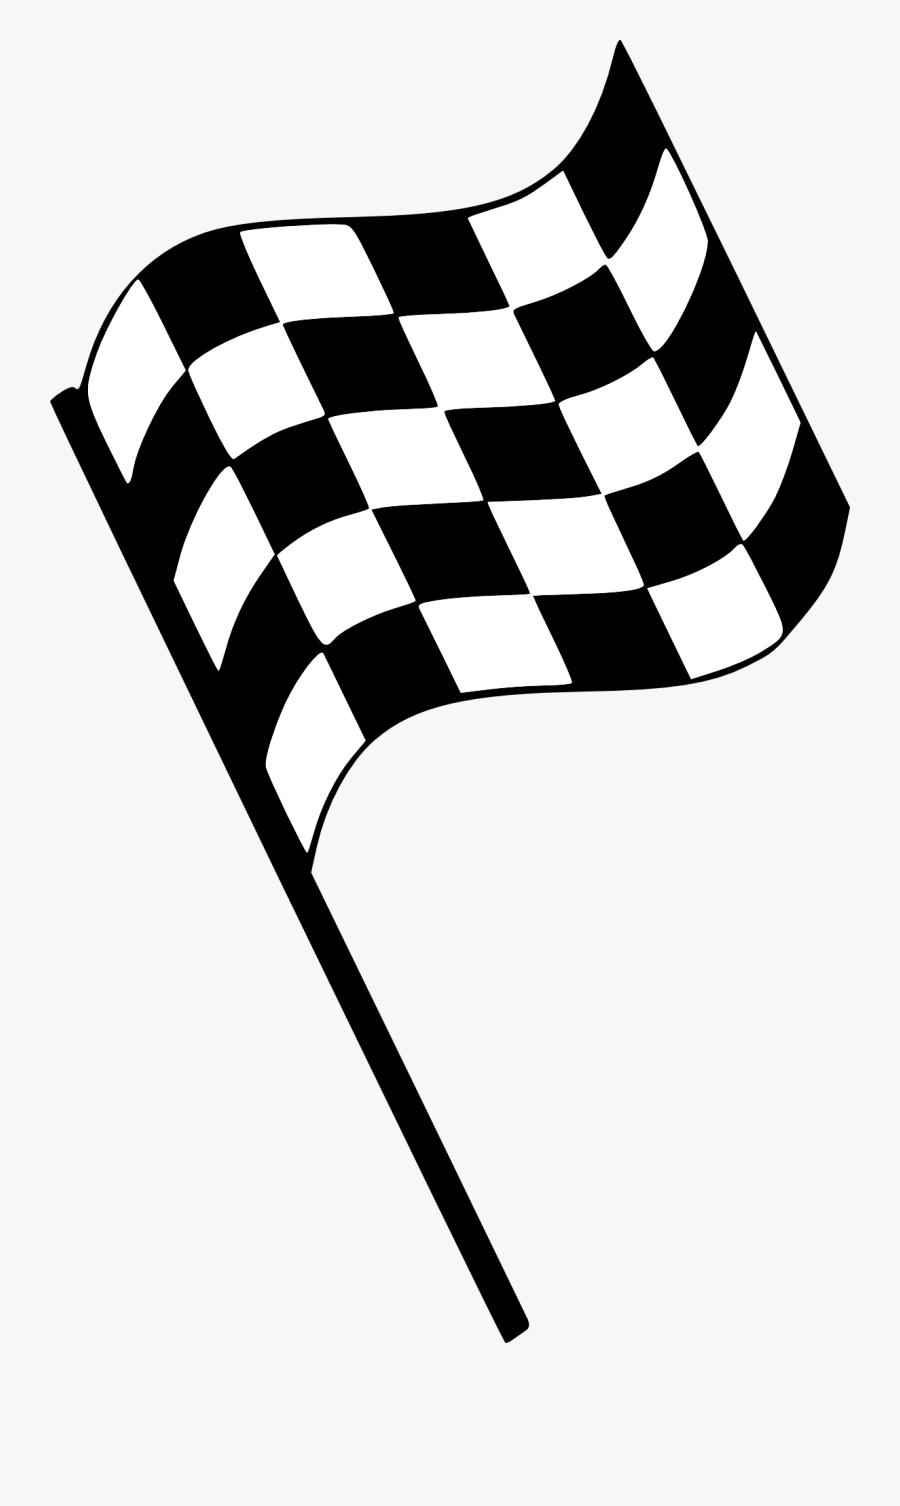 Finish Line Flag Clipart - Finish Line Flag Png, Transparent Clipart